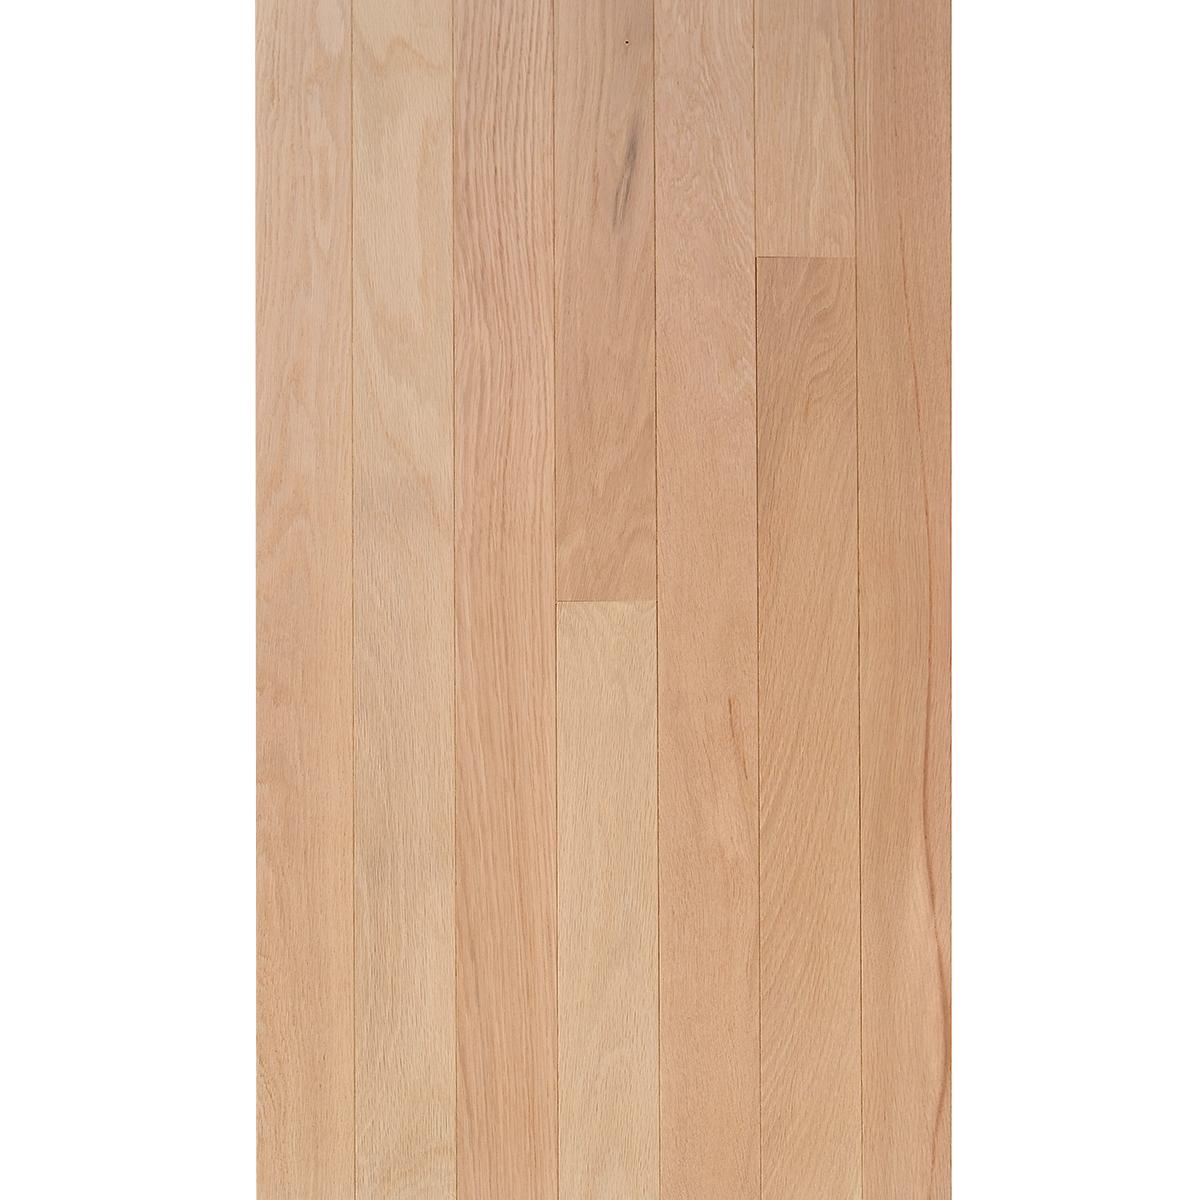 "White Oak 3/4"" x 3-1/4"" Select Grade Flooring"